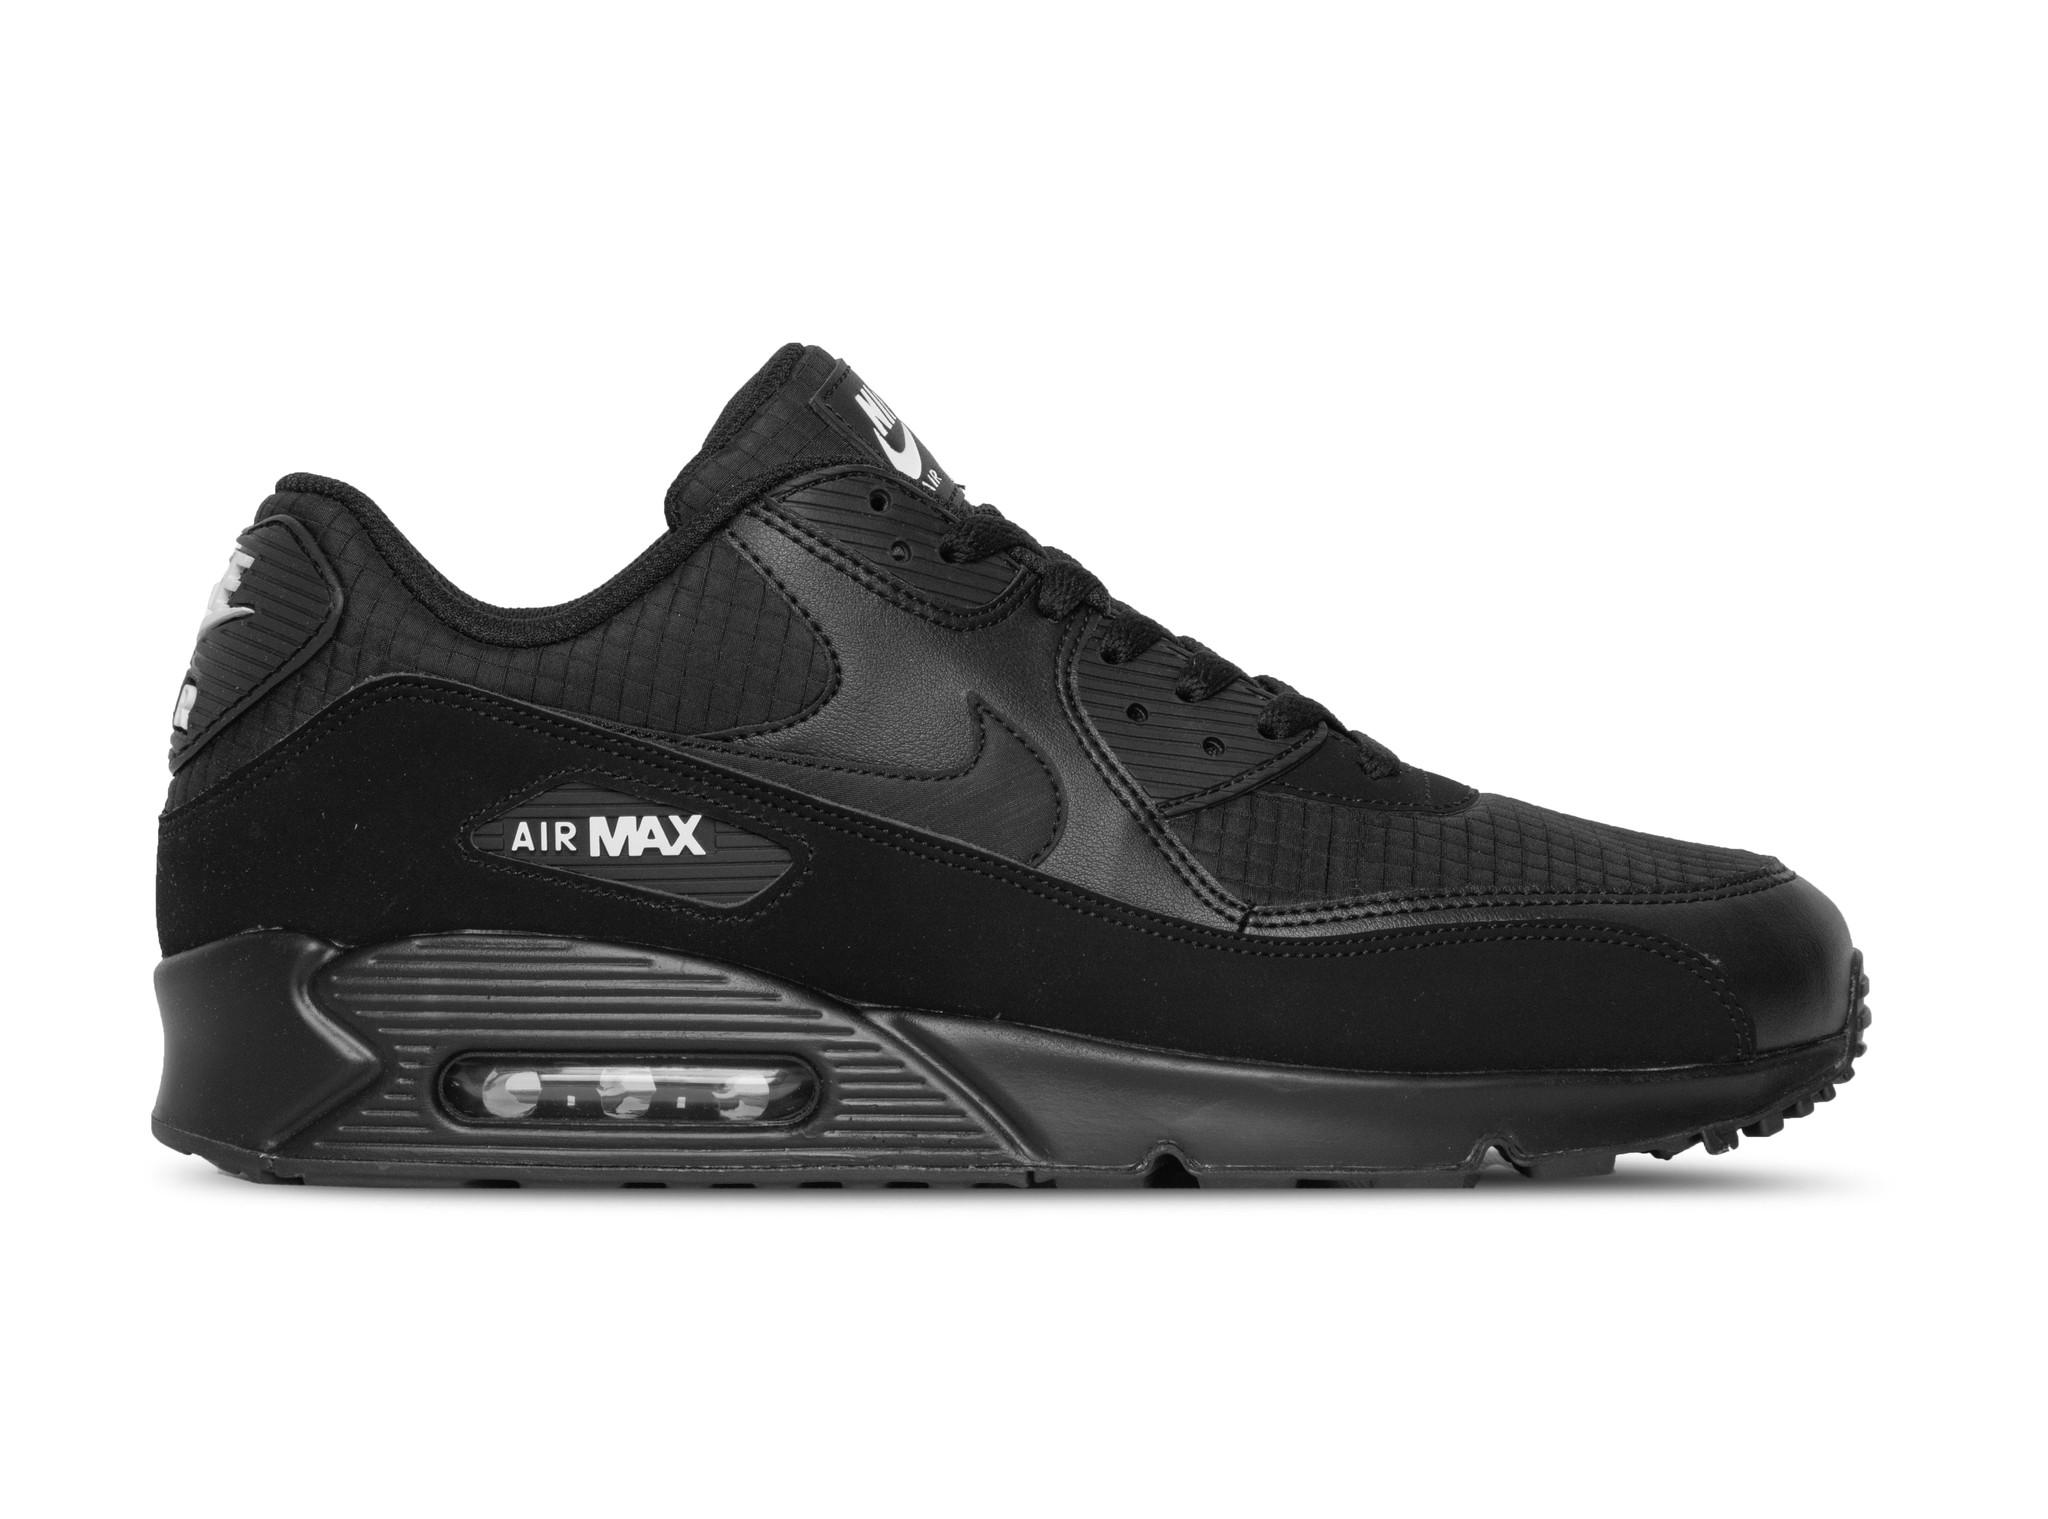 Air Max 90 Essential Black AJ1285 019 Bruut Sneakers